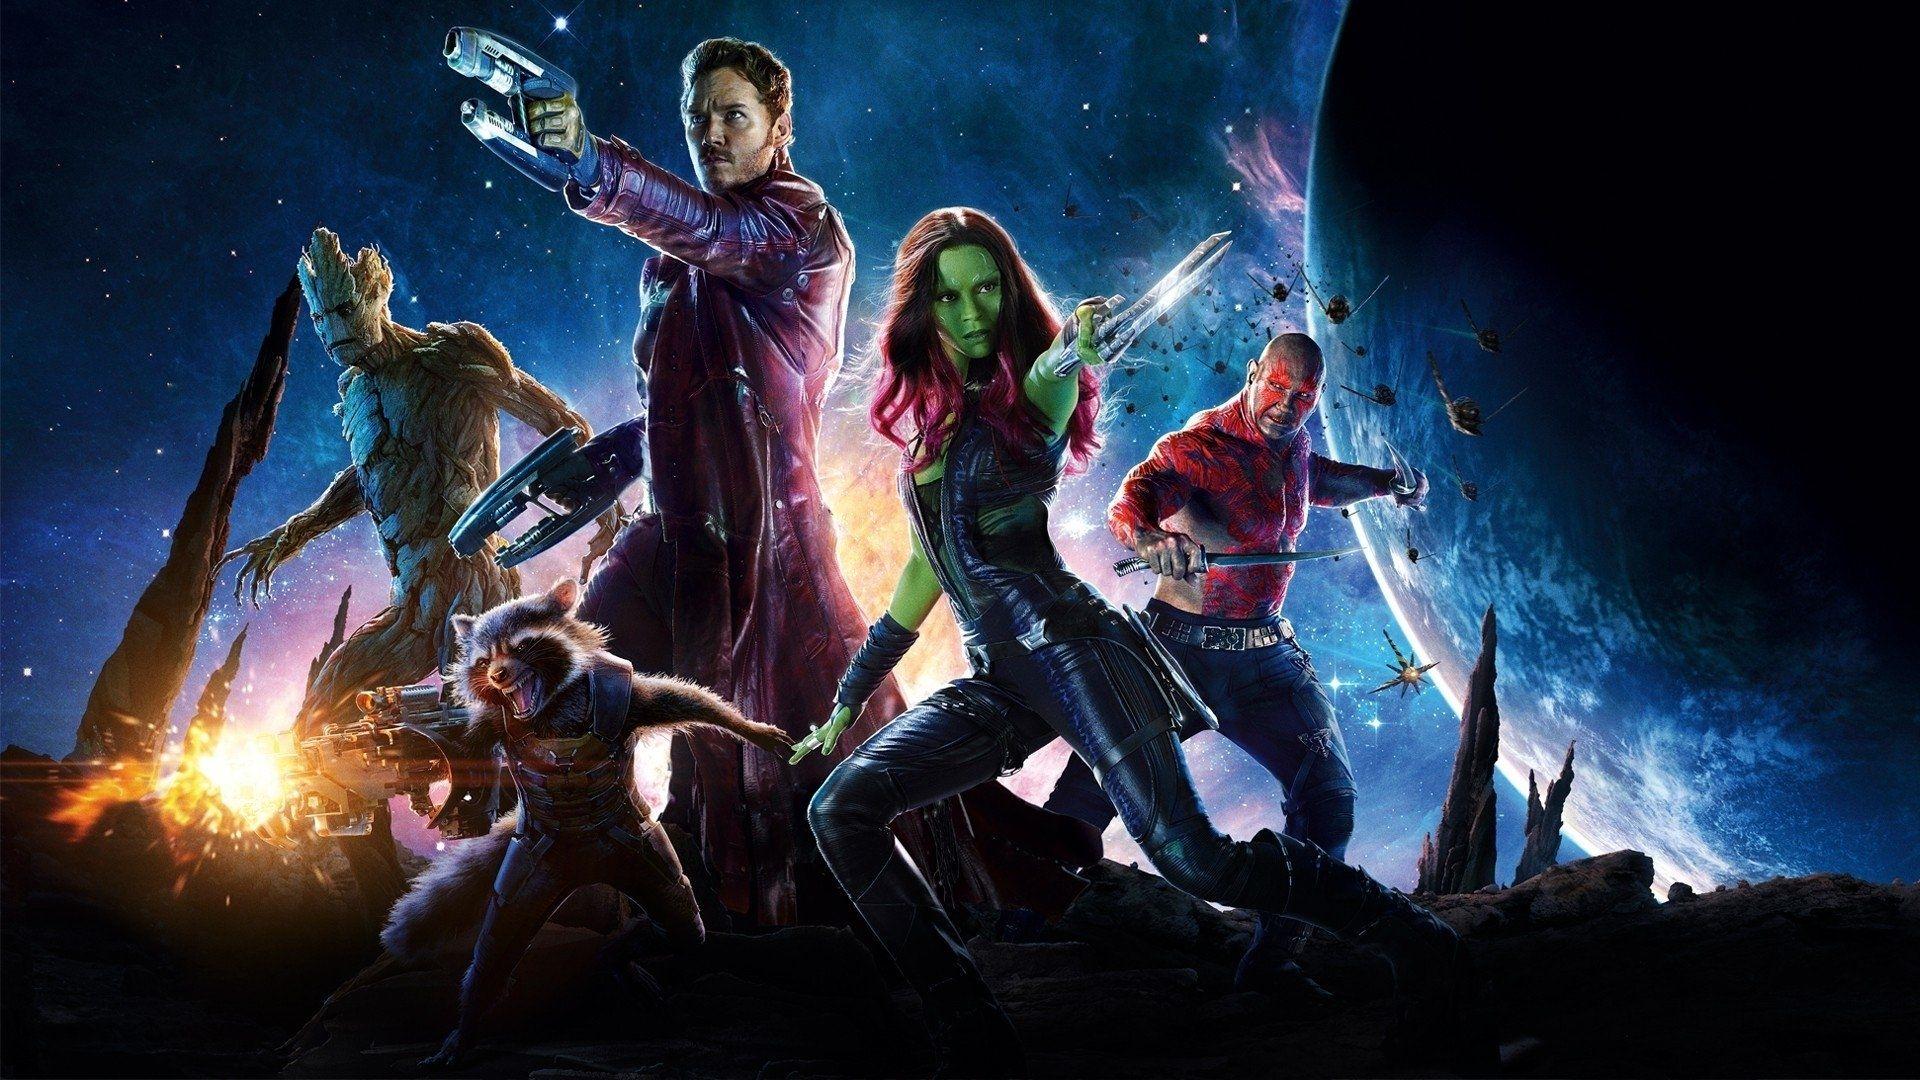 10 Top Guardians Of The Galaxy Backgrounds Full Hd 1920 1080 For Pc Desktop Klassieke Films Films Online Animatie